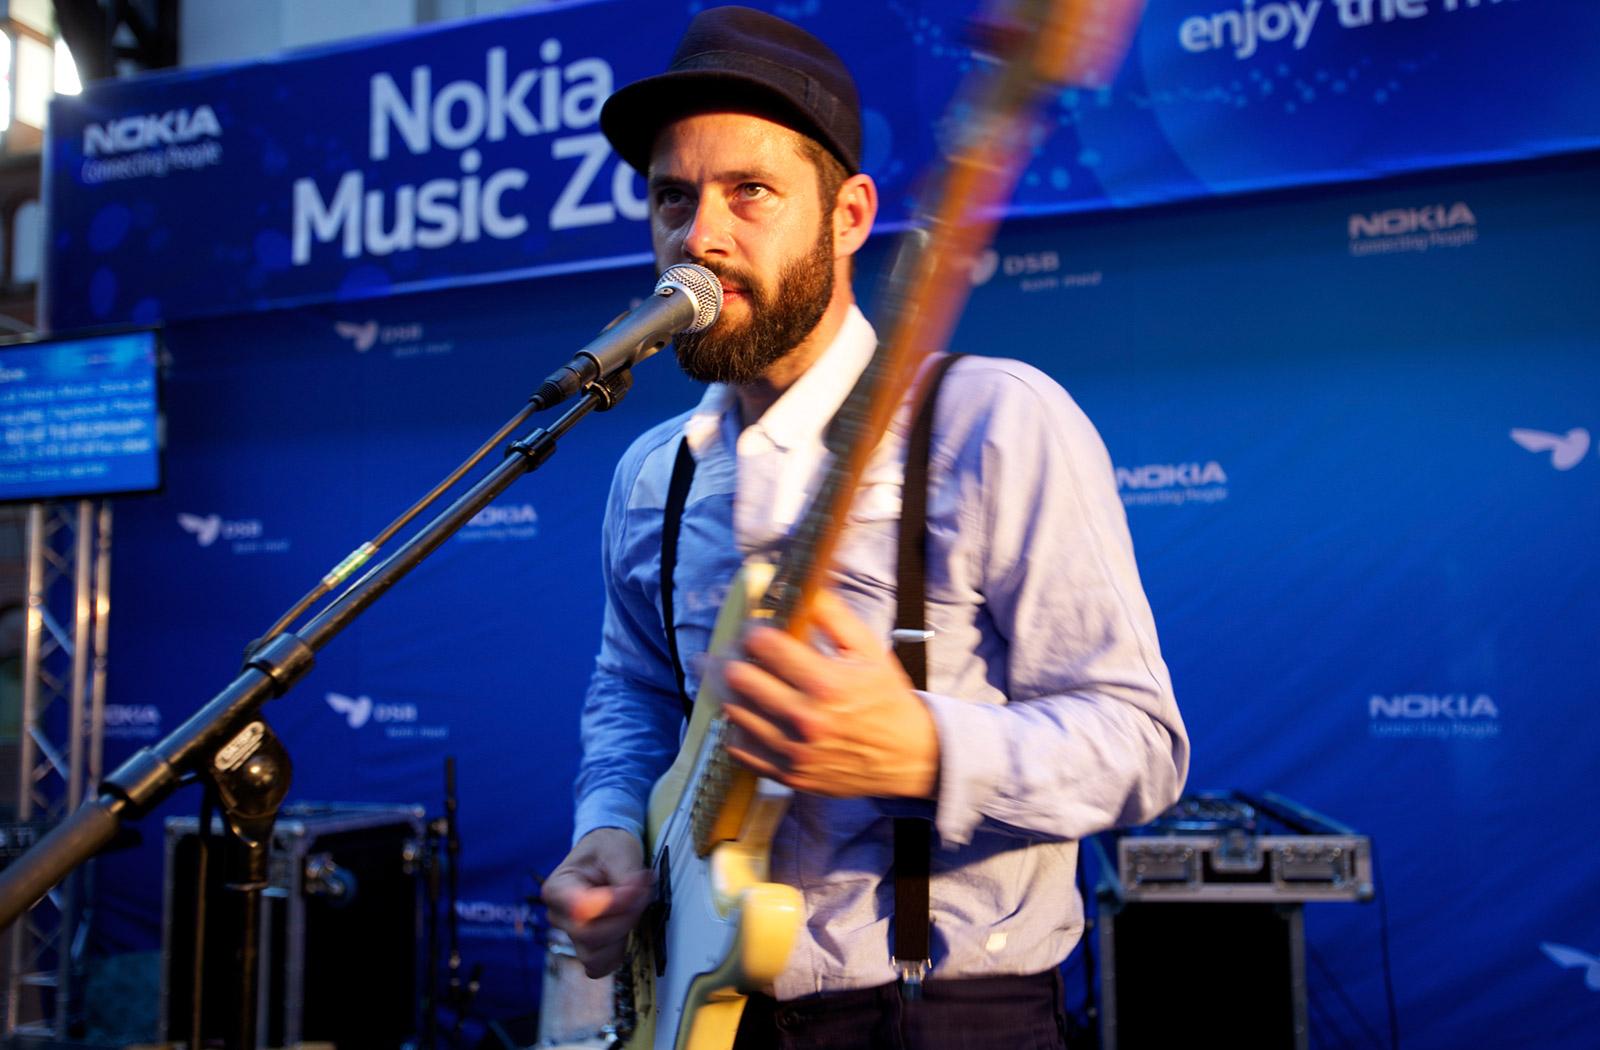 Nokia Music Zone